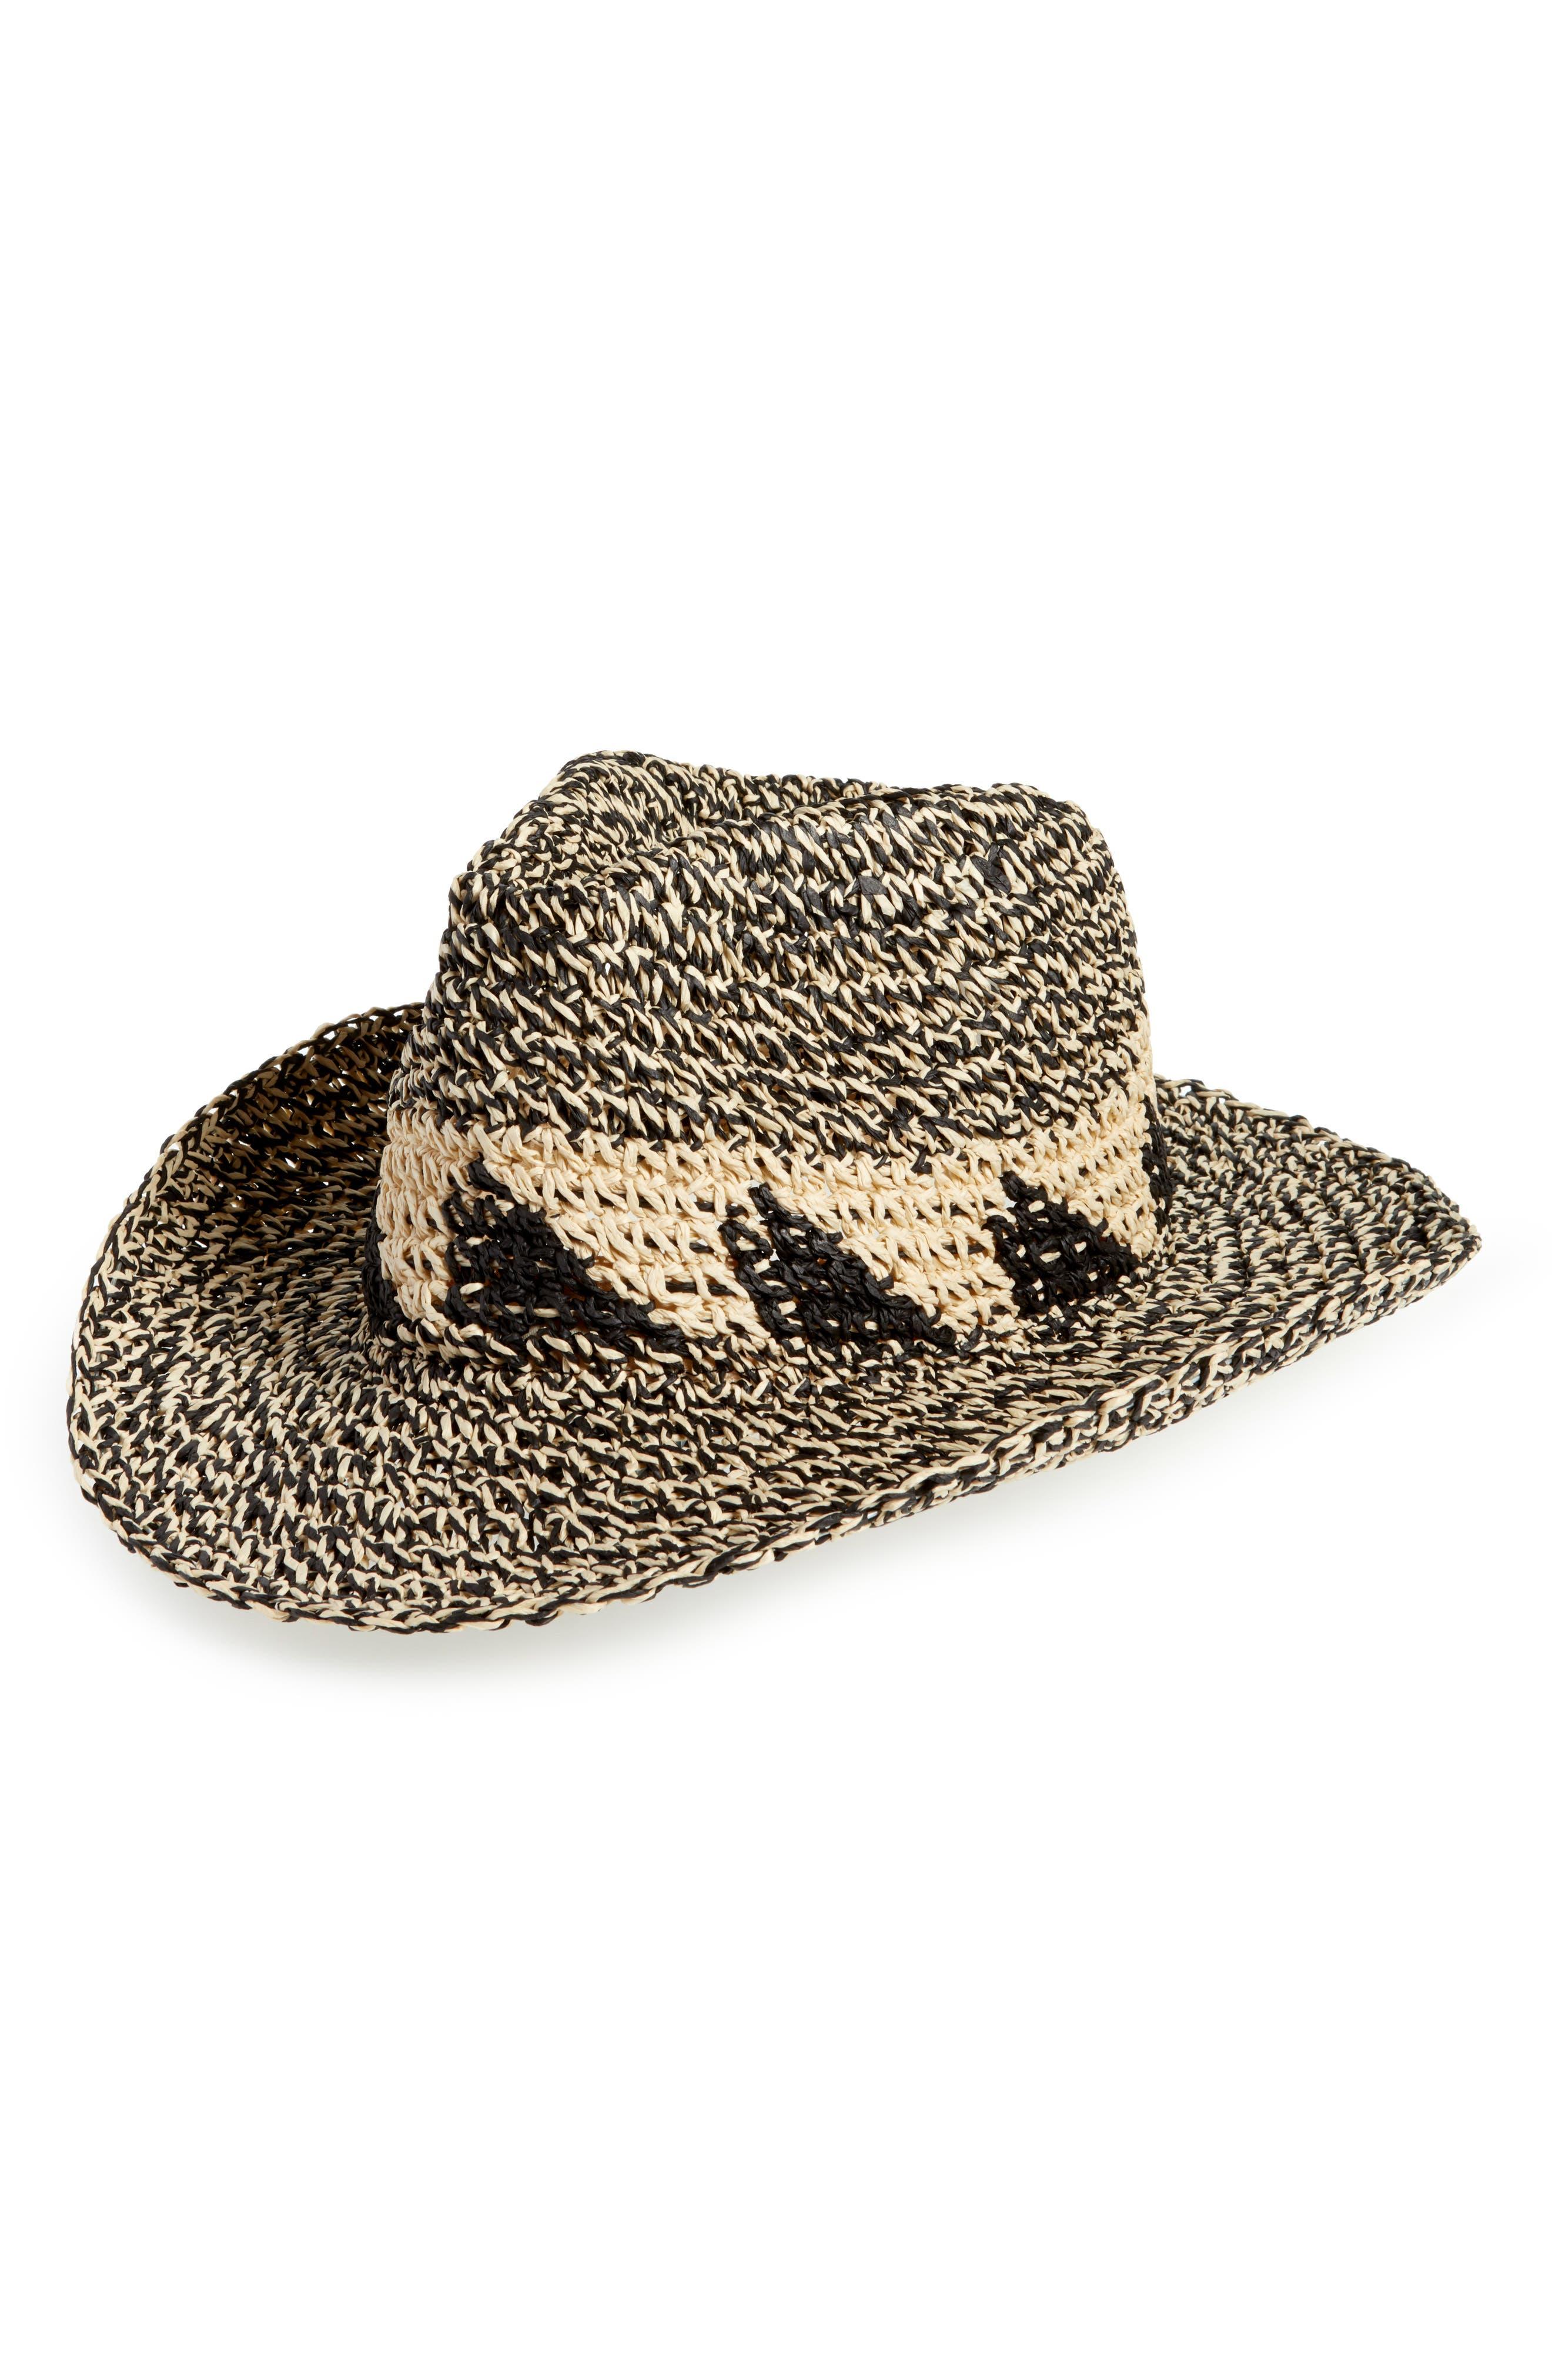 Marled Straw Cowboy Hat,                         Main,                         color, 260